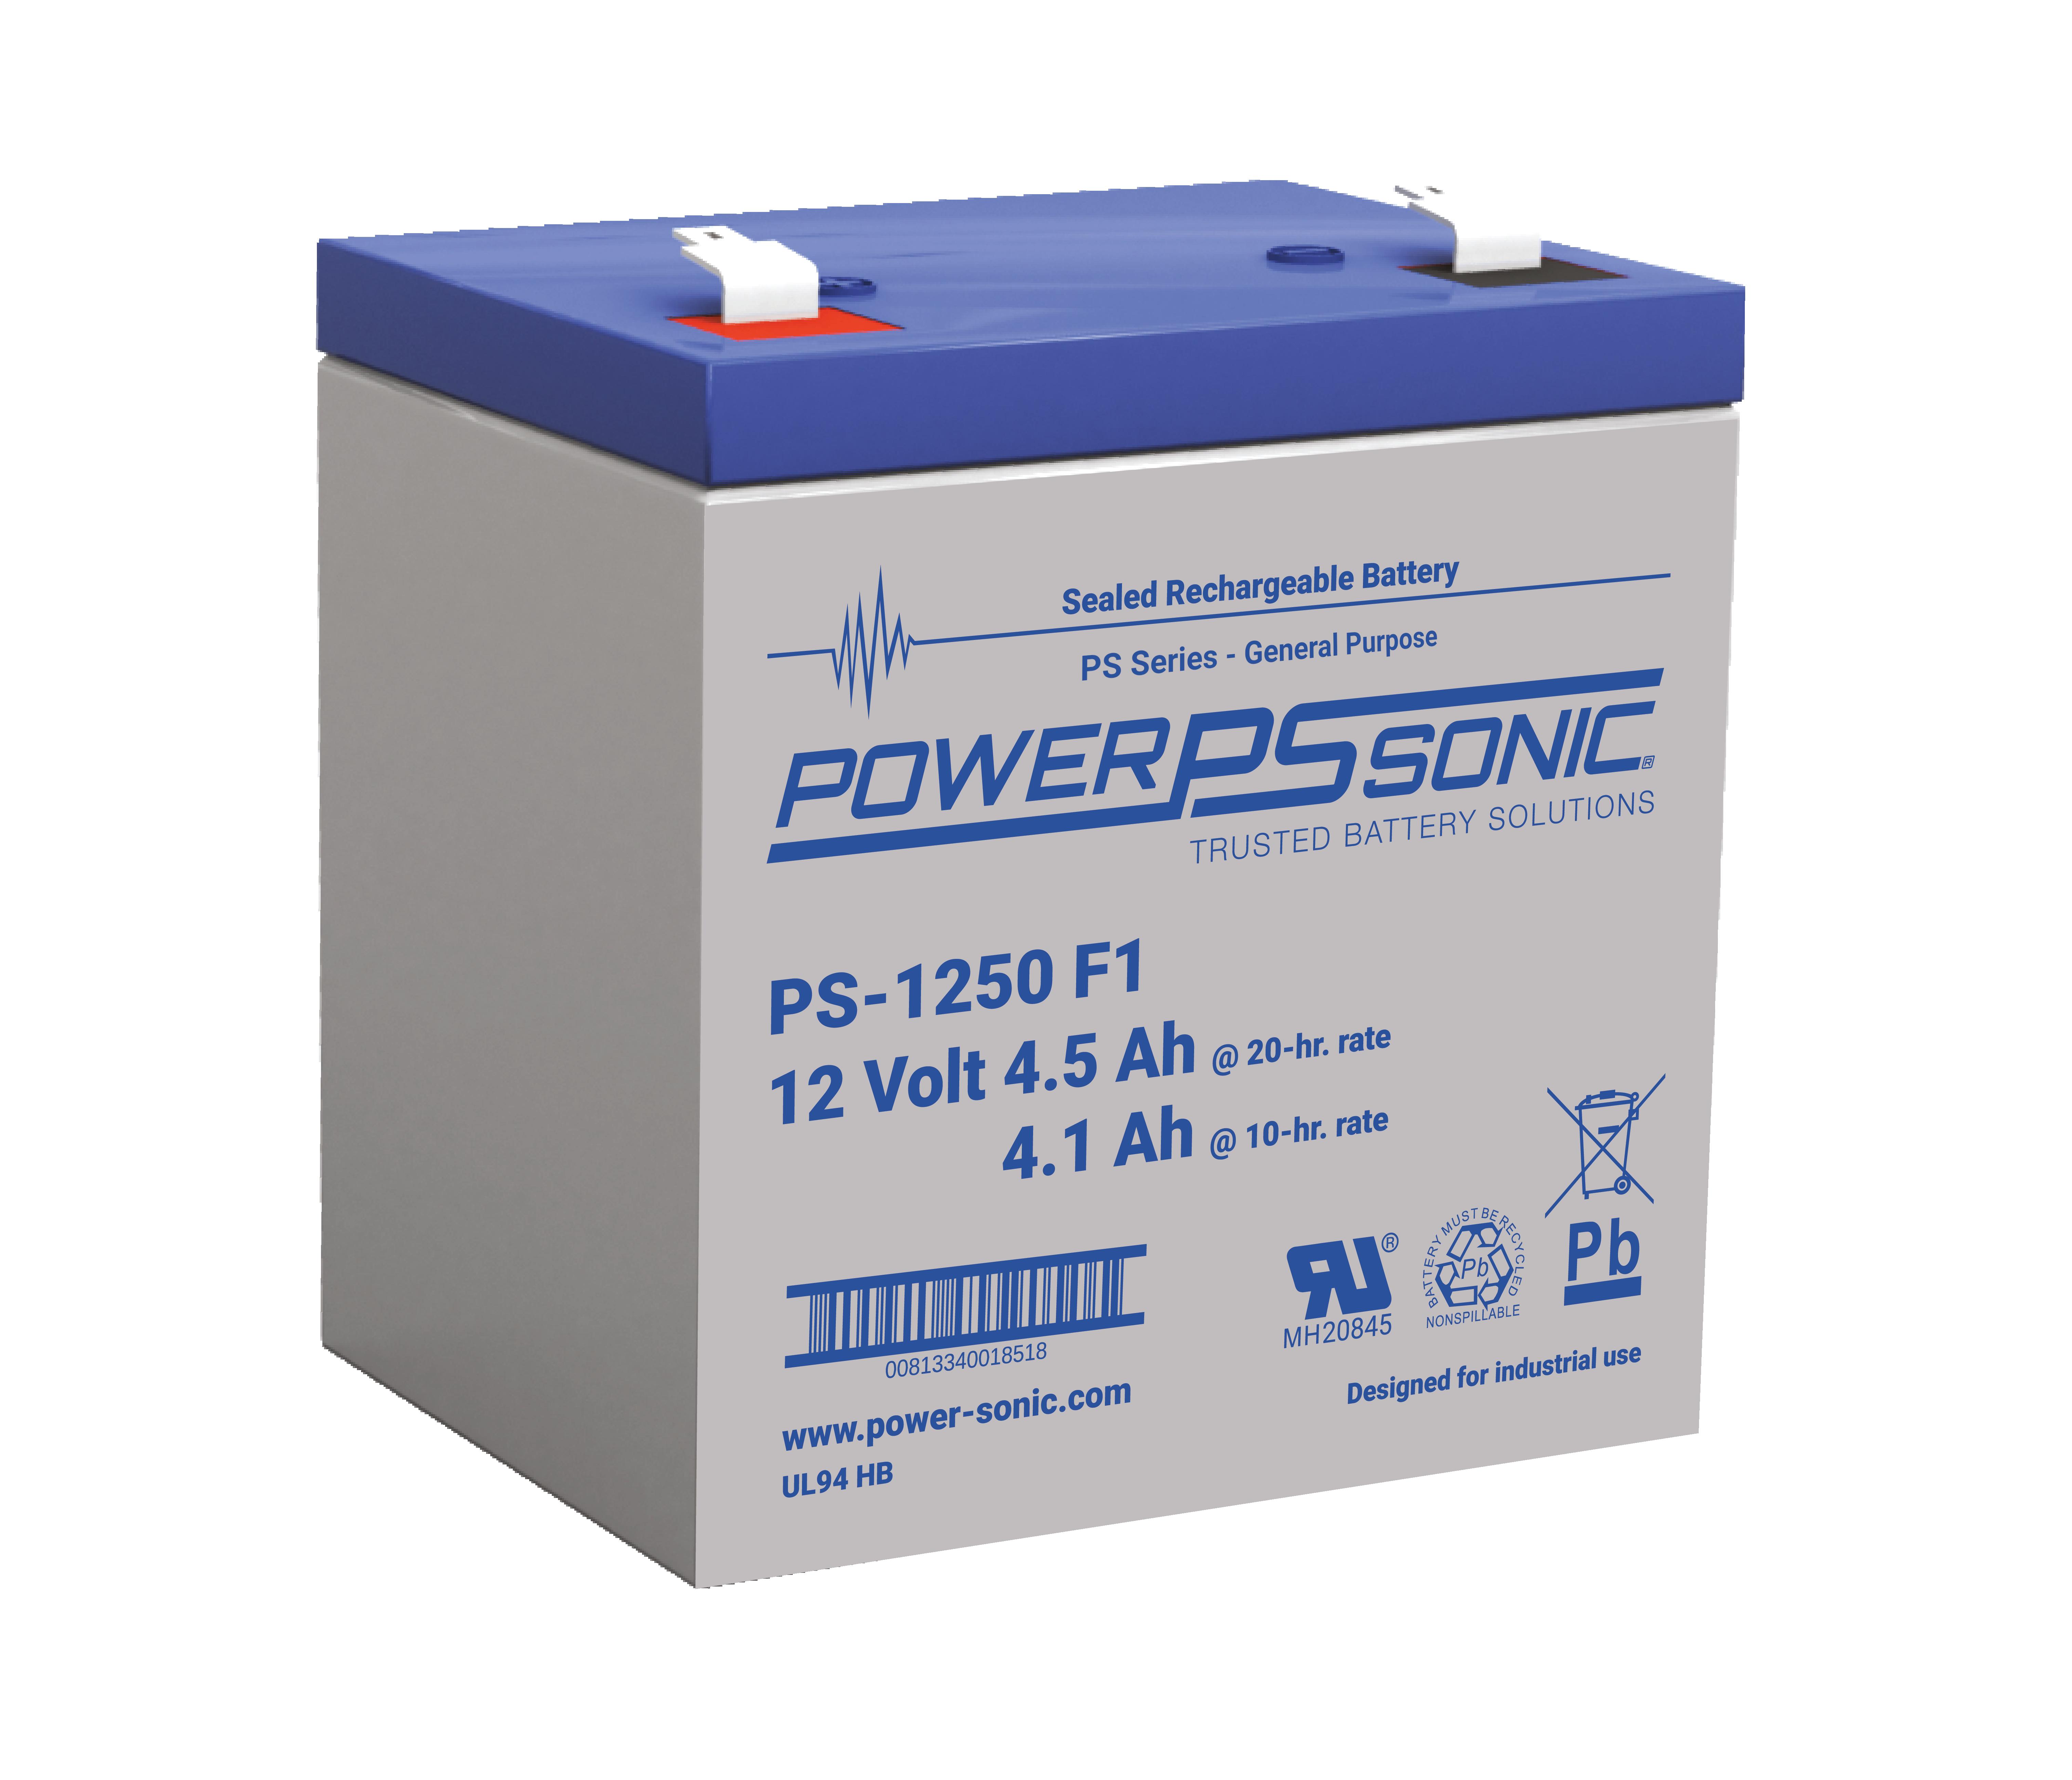 PS-1250